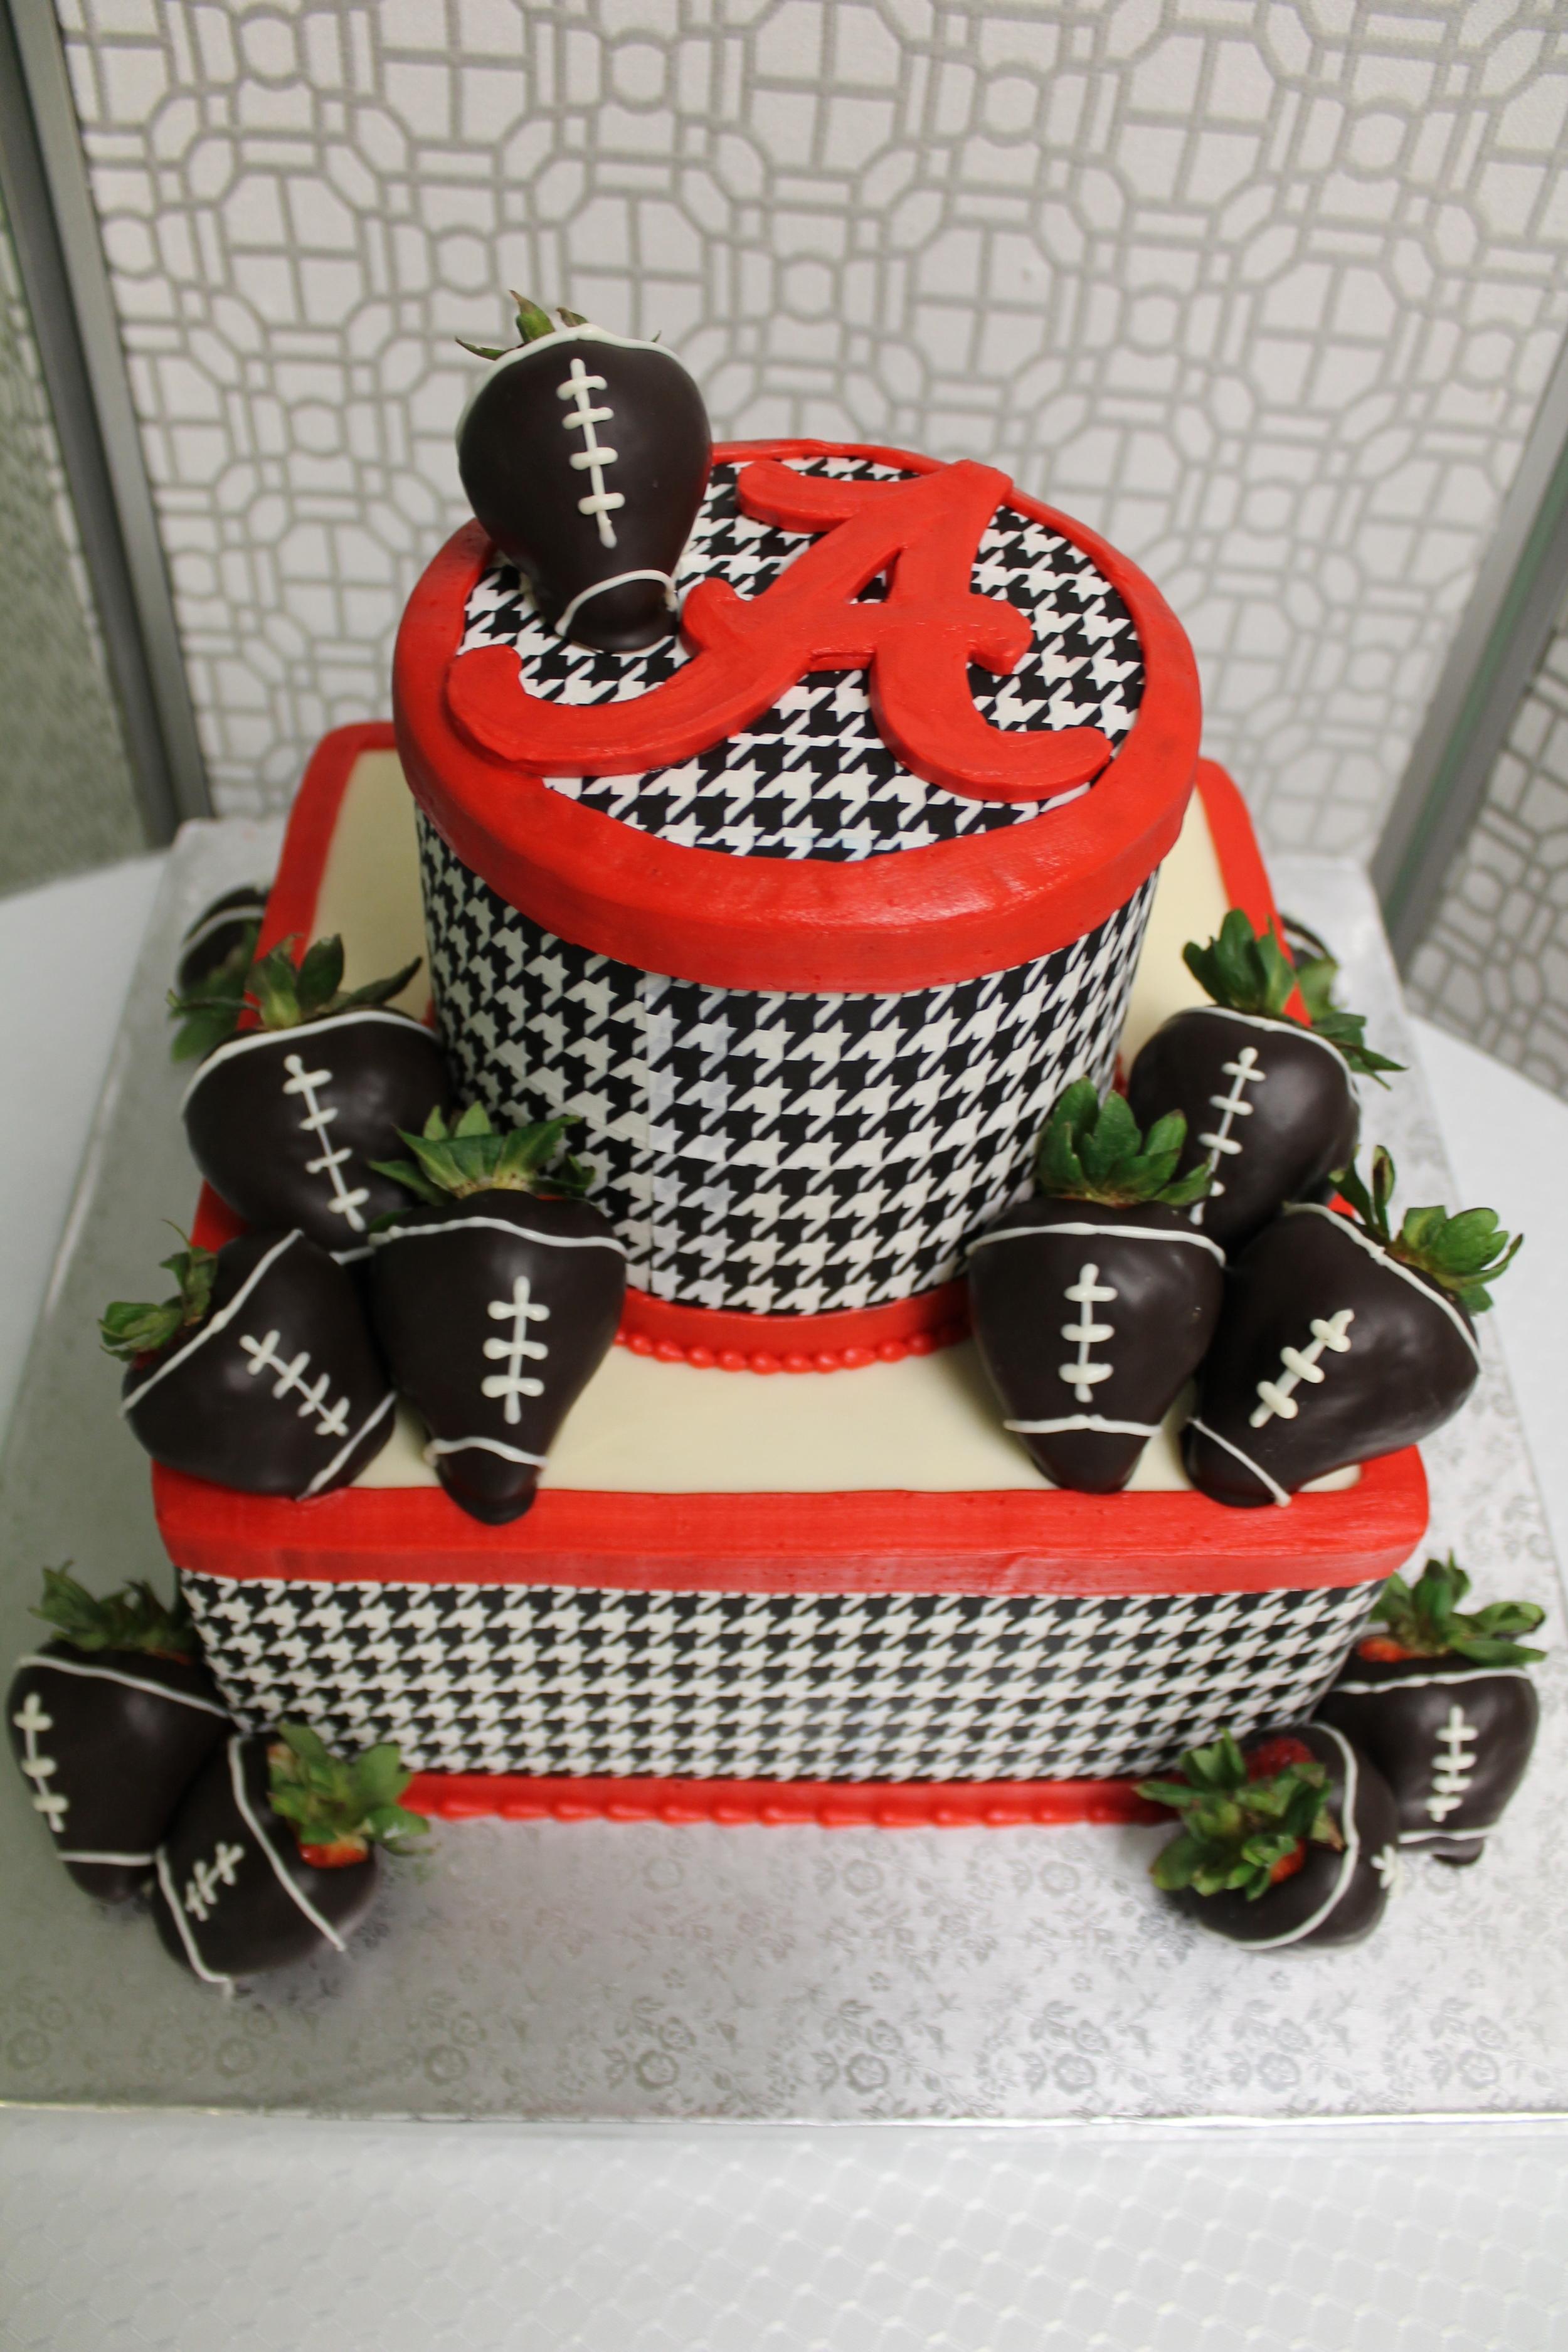 College Football Groom's Cake